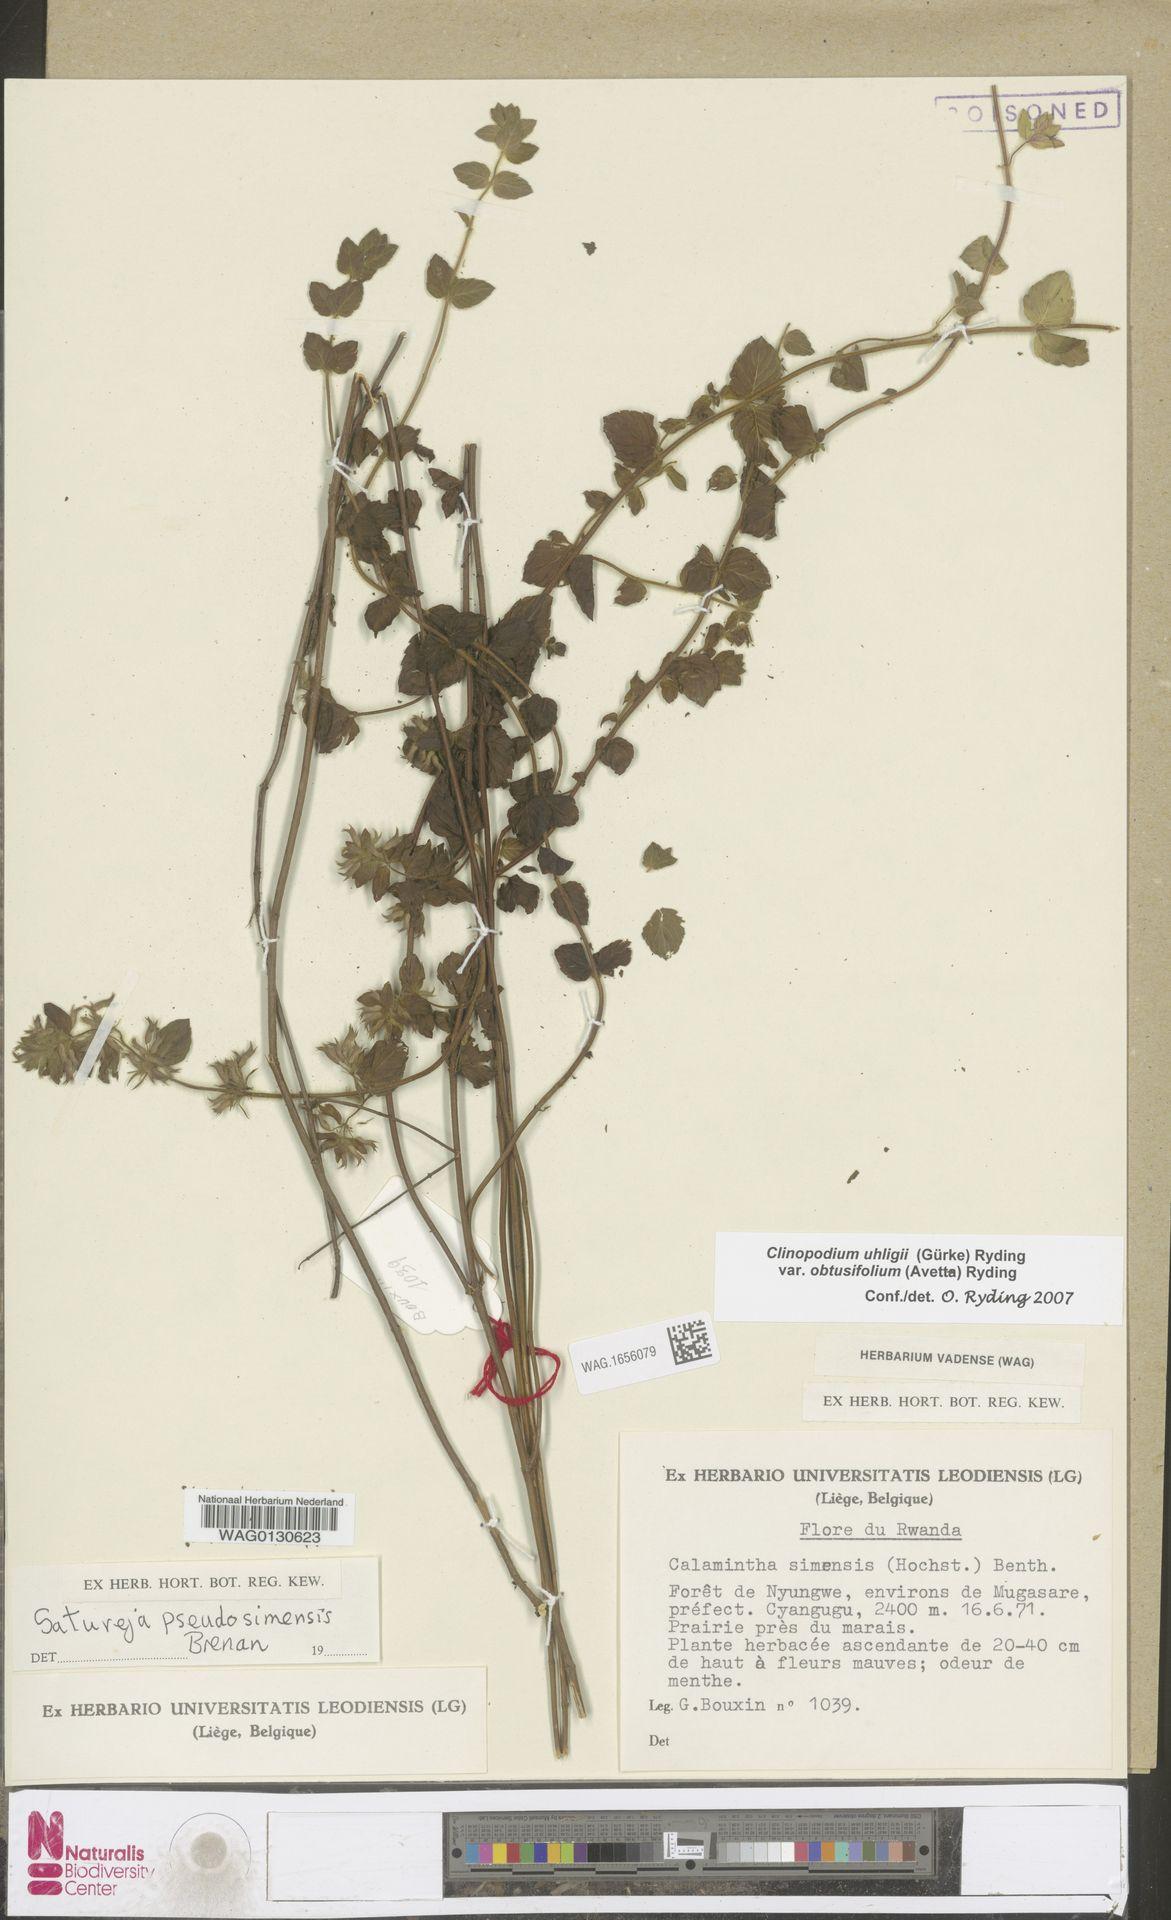 WAG.1656079 | Clinopodium uhligii var. obtusifolium (Avetta) Ryding